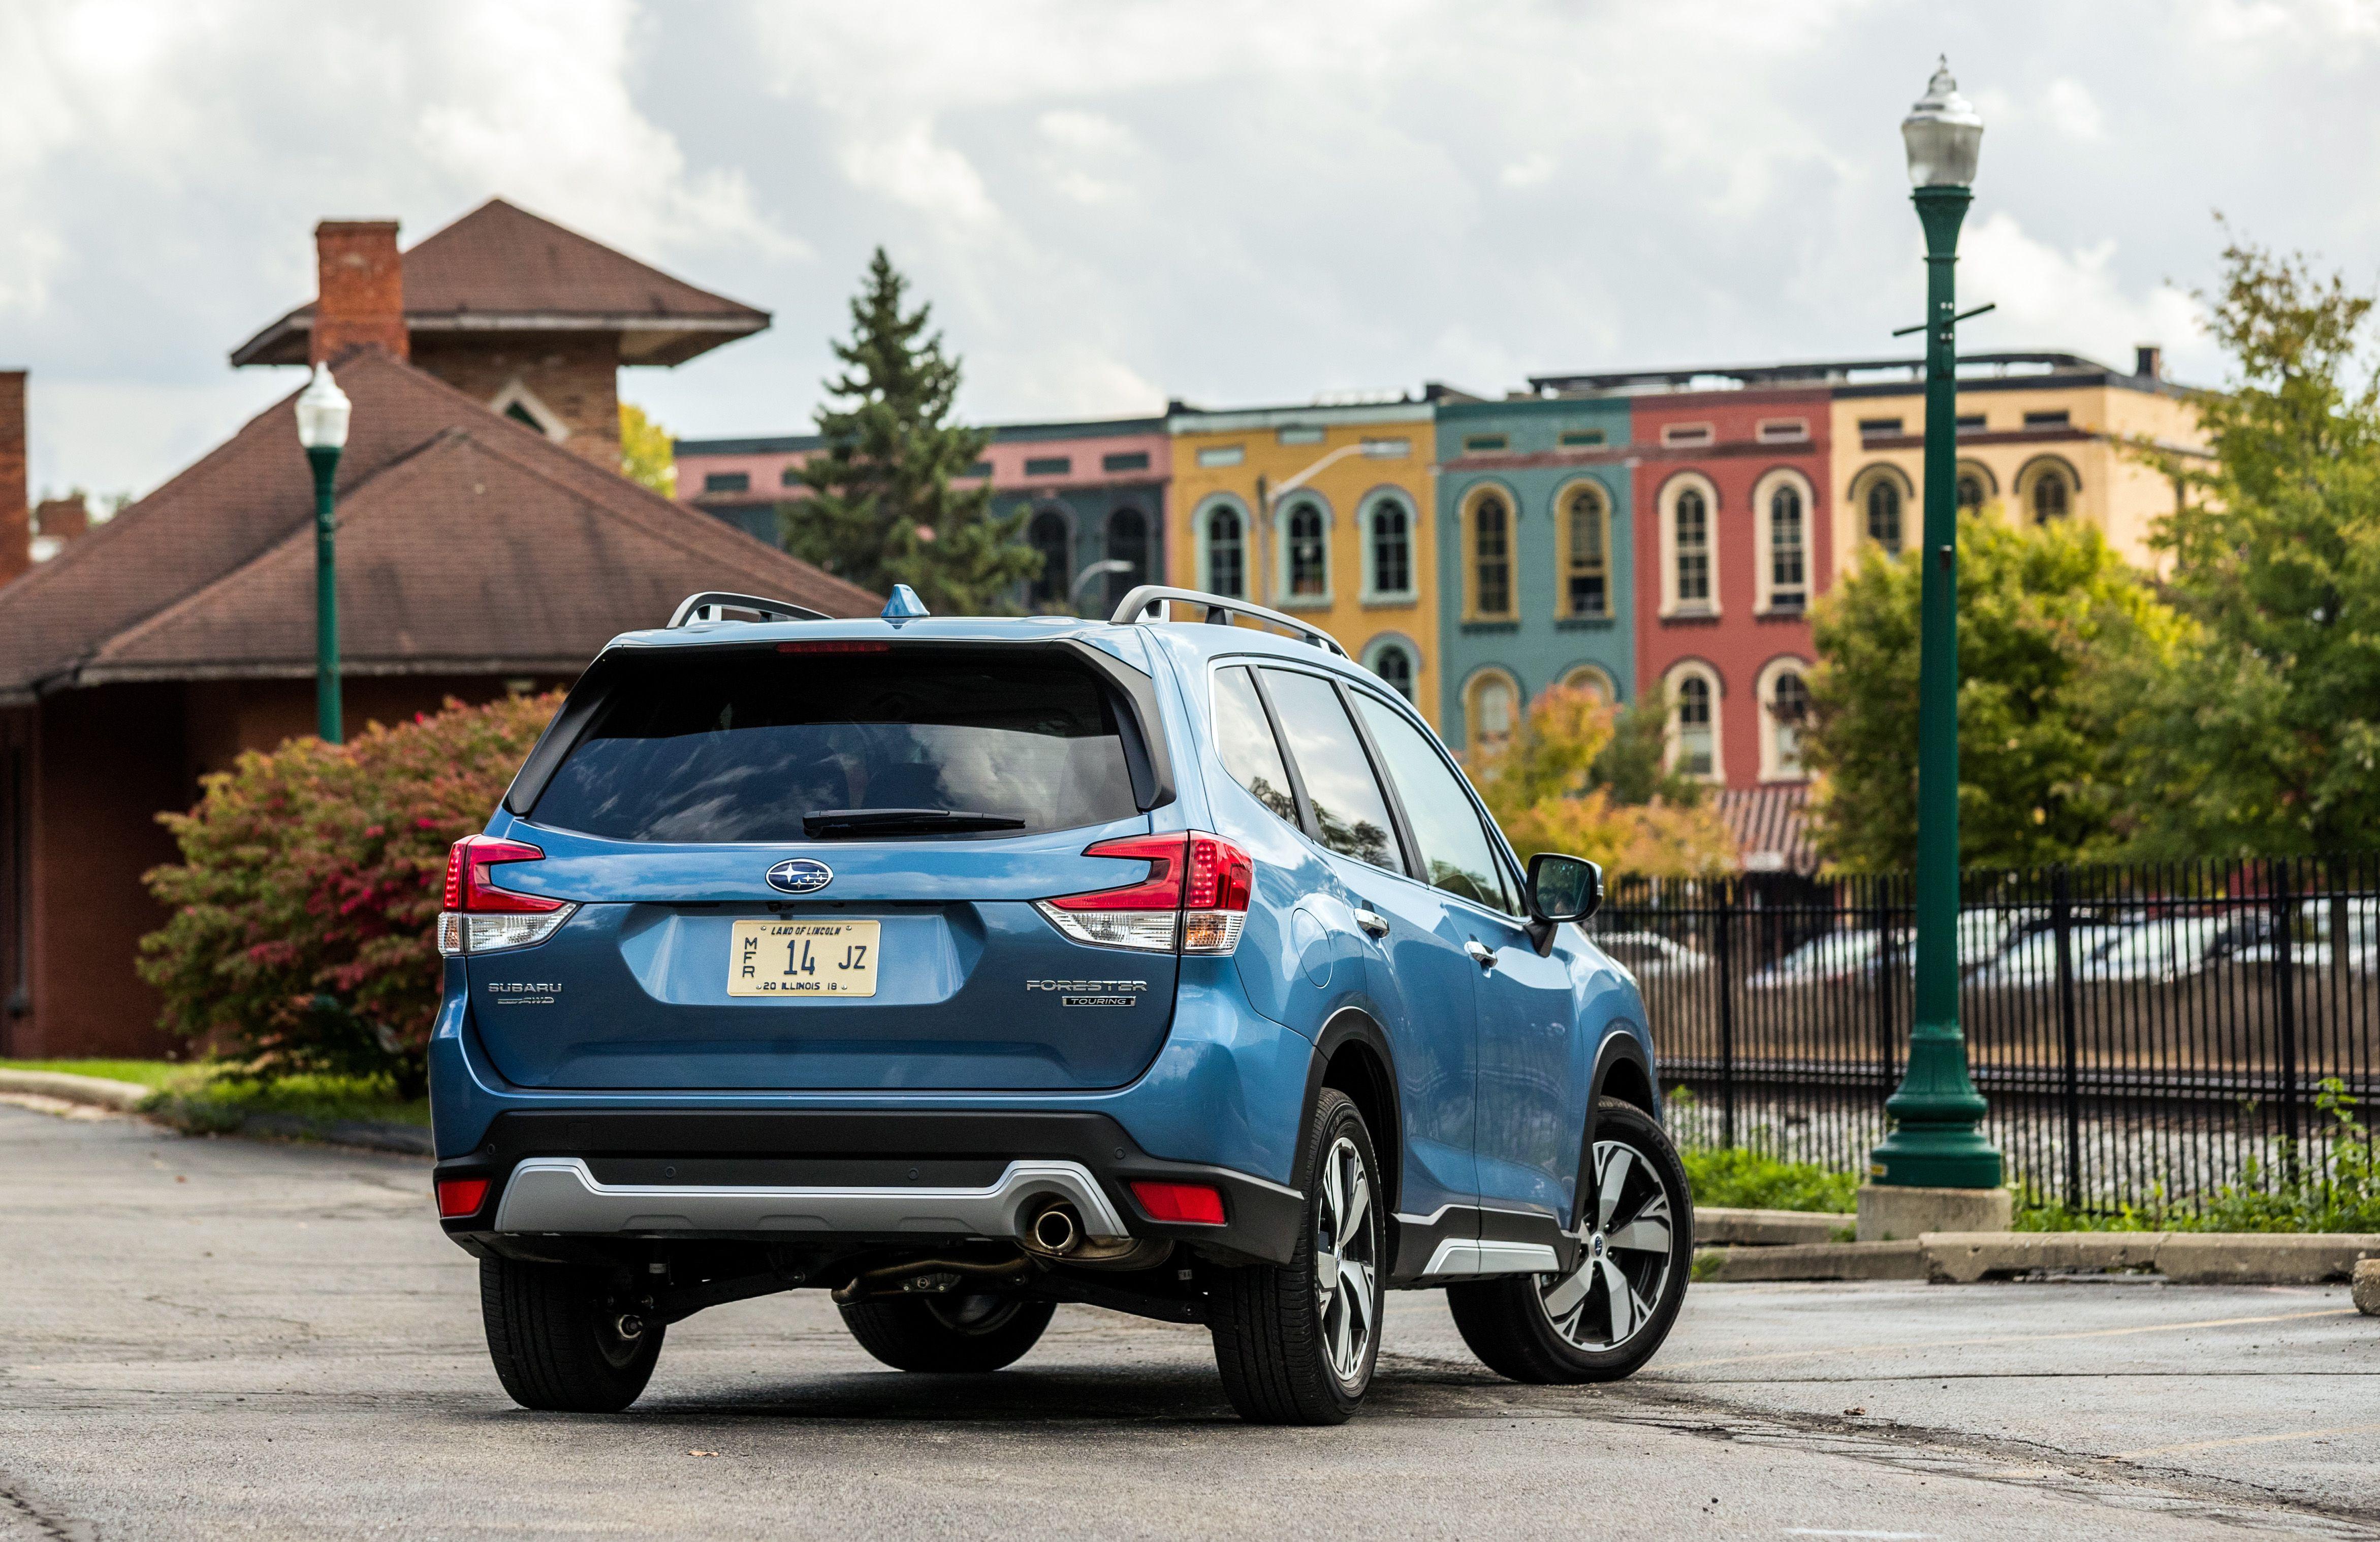 2019 Subaru Forester Reviews Price Photos And Specs Car Driver